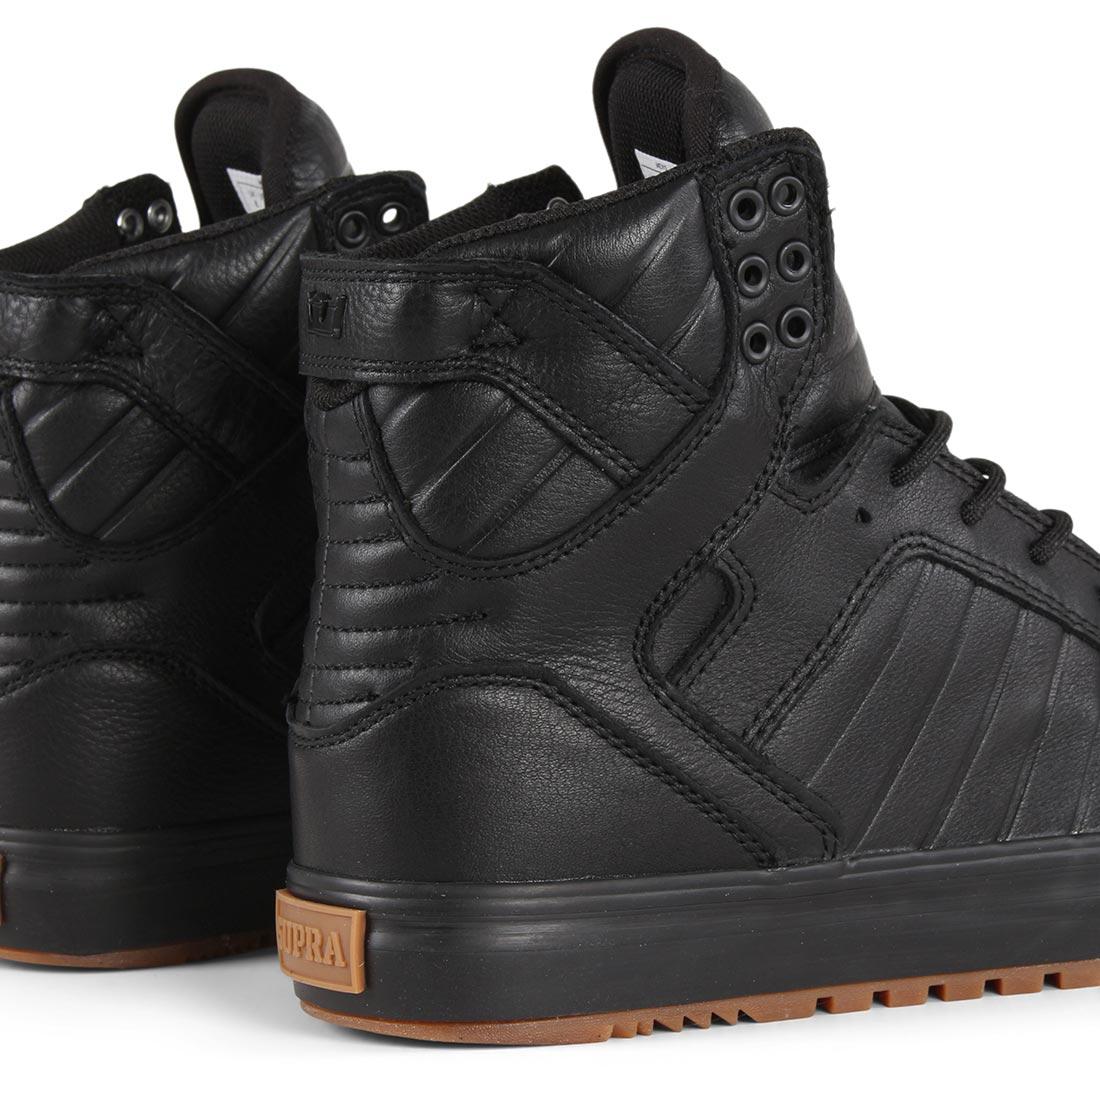 Supra Skytop CW Shoes - Black / Black / Gum